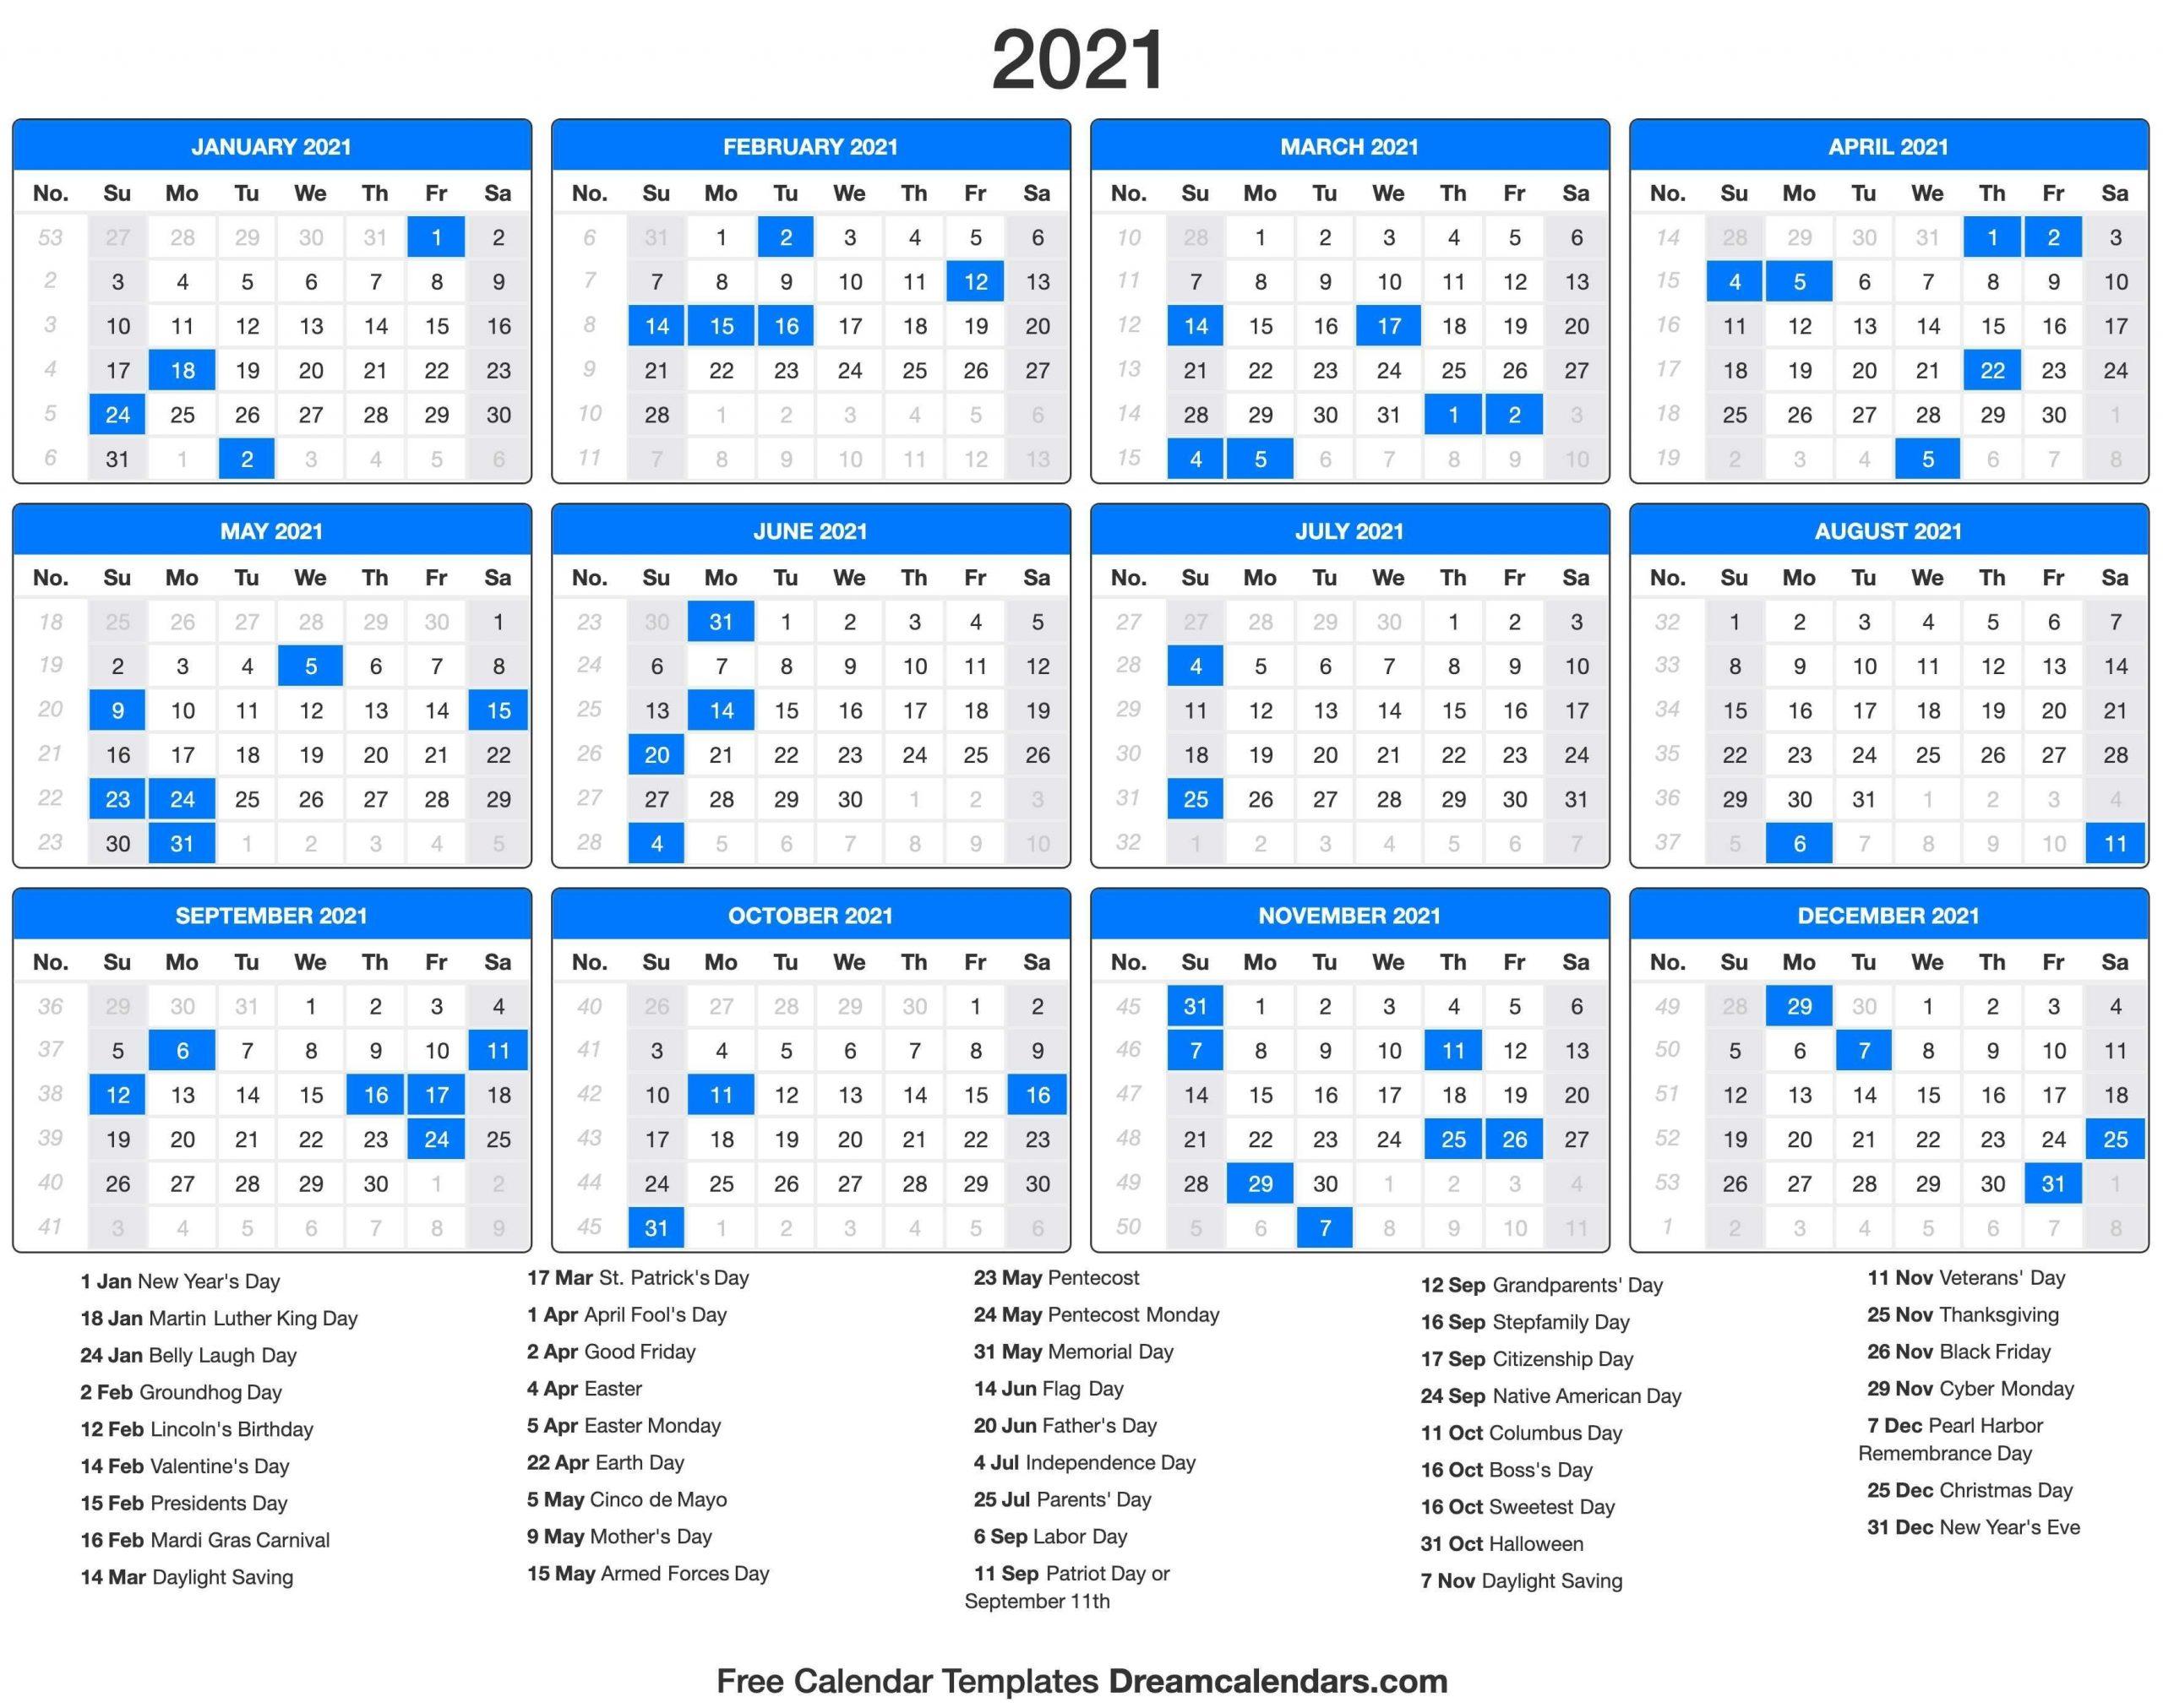 2021 Calendar With Holidays - Dream Calendars | Holiday-2021 School Holiday Calender